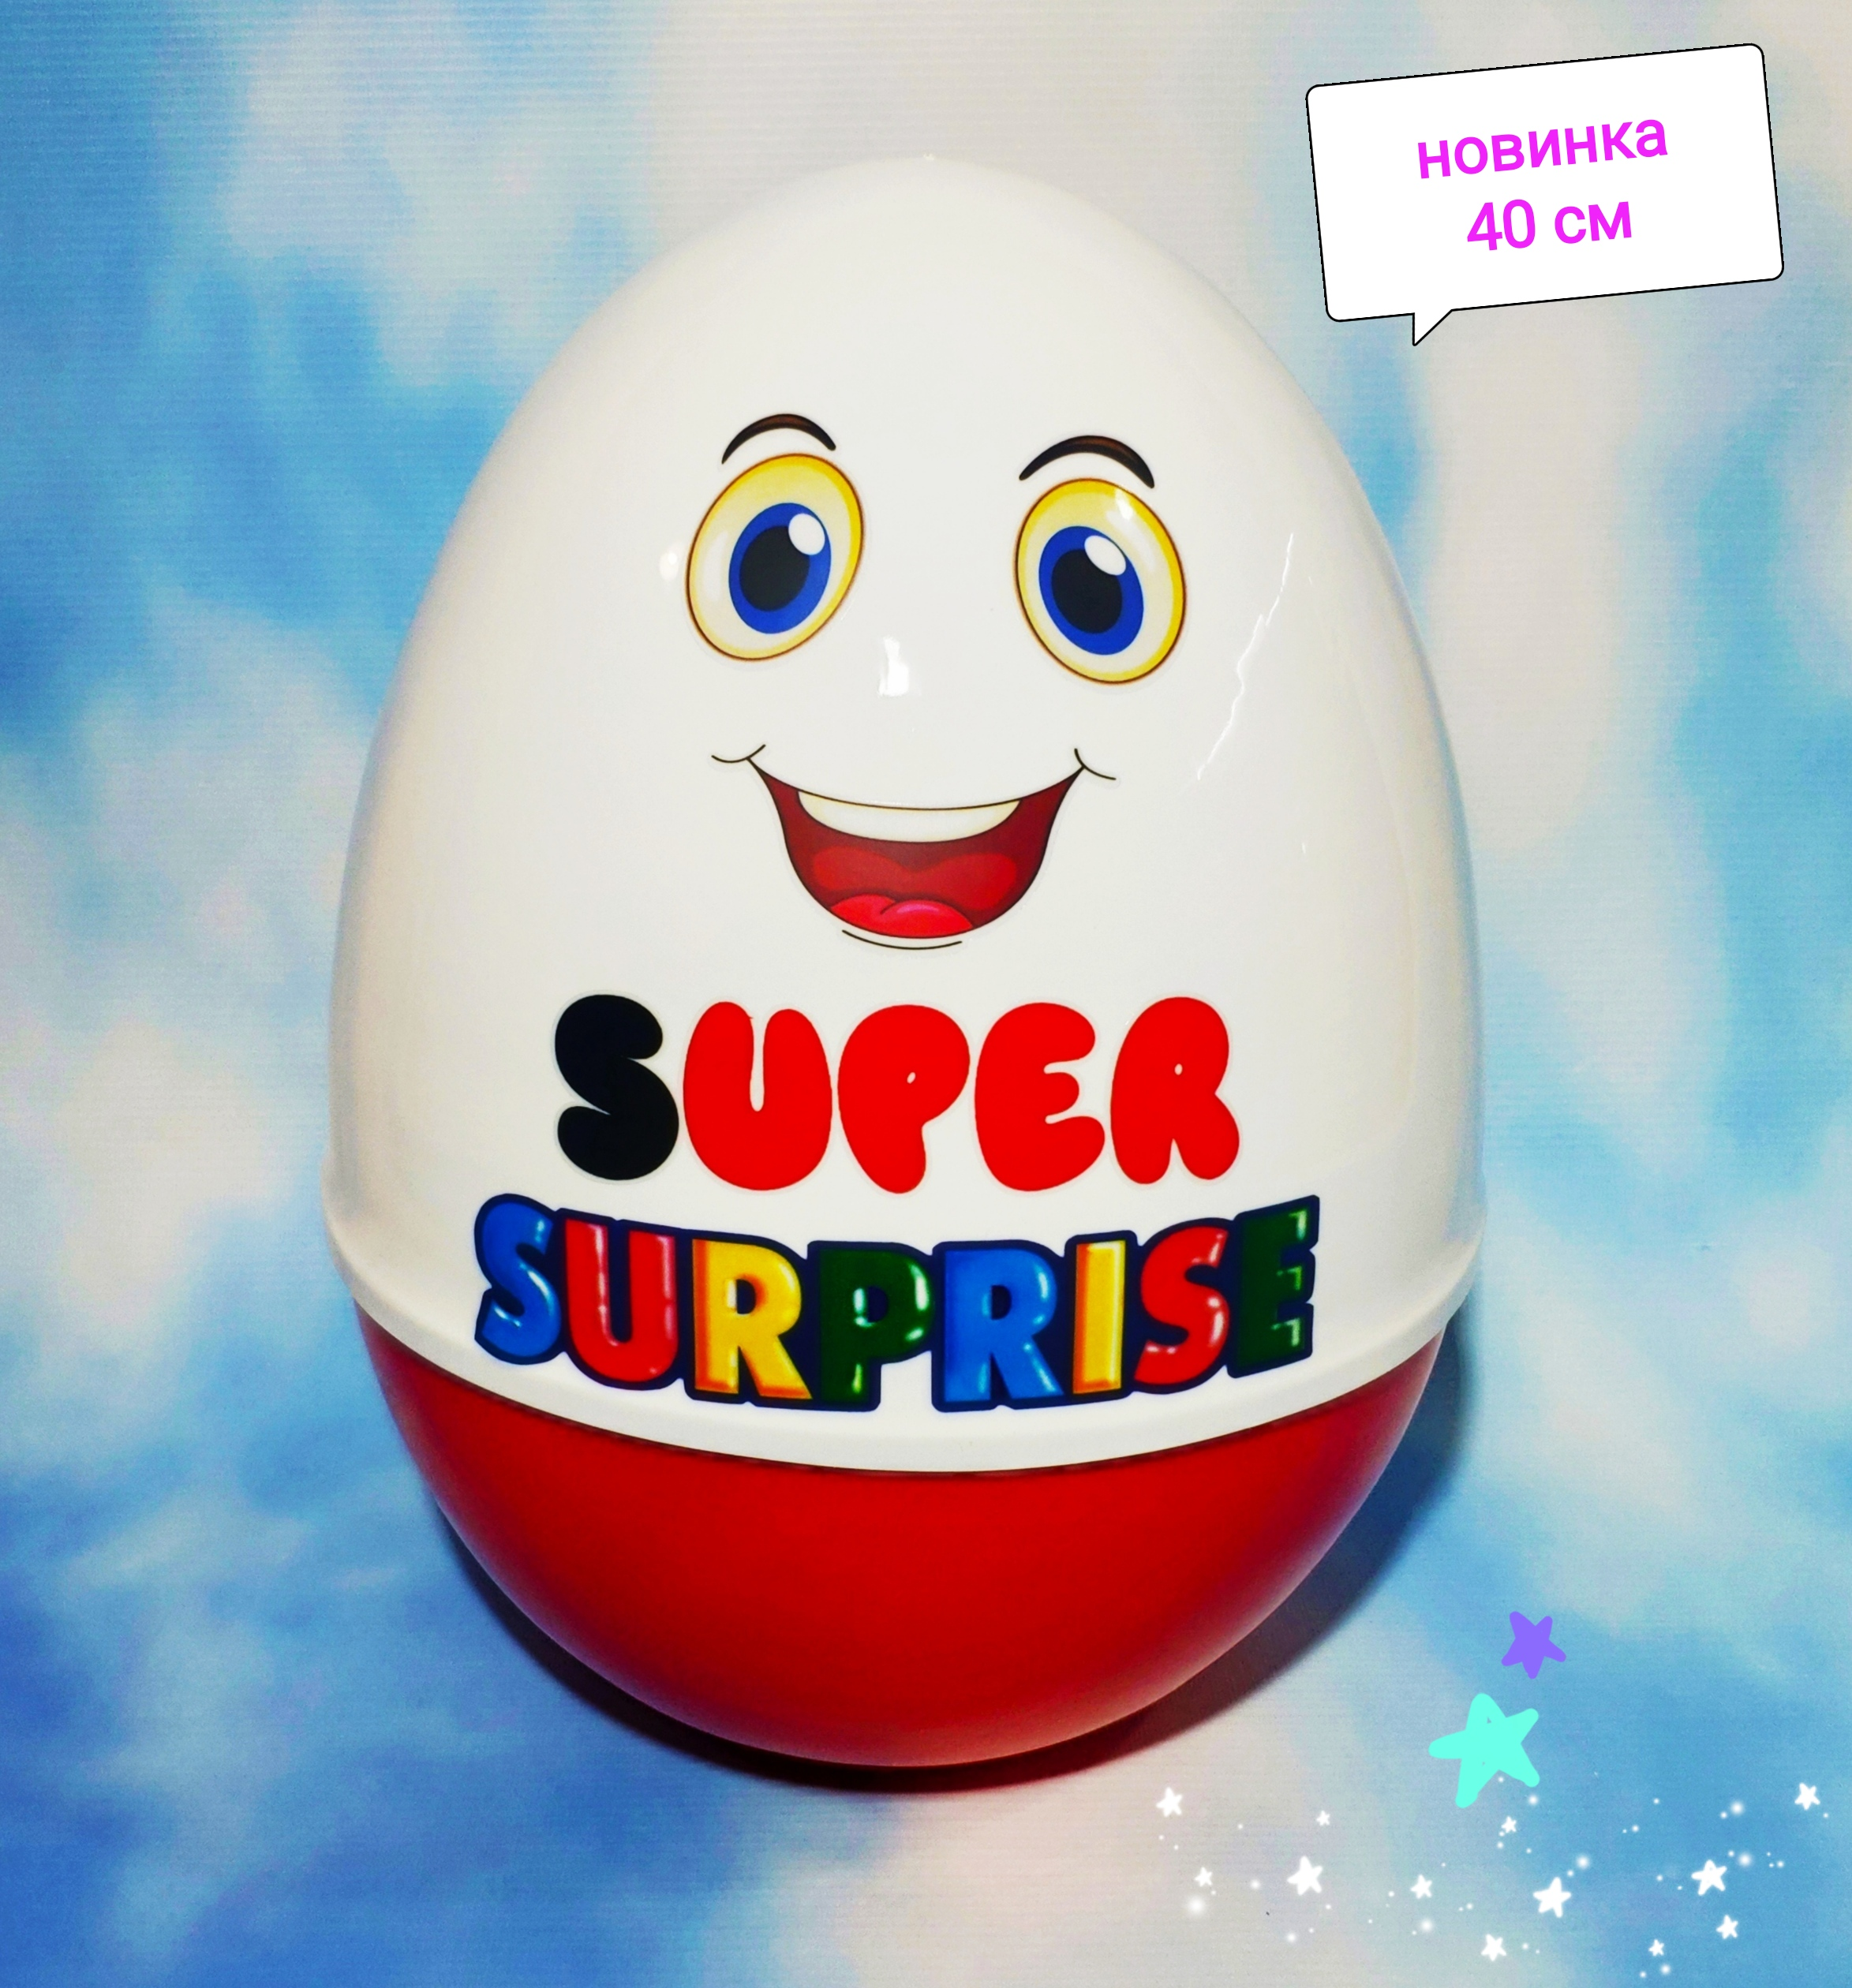 https://super-maxi-surprise.ru/images/upload/IMG_20200929_222129.jpg